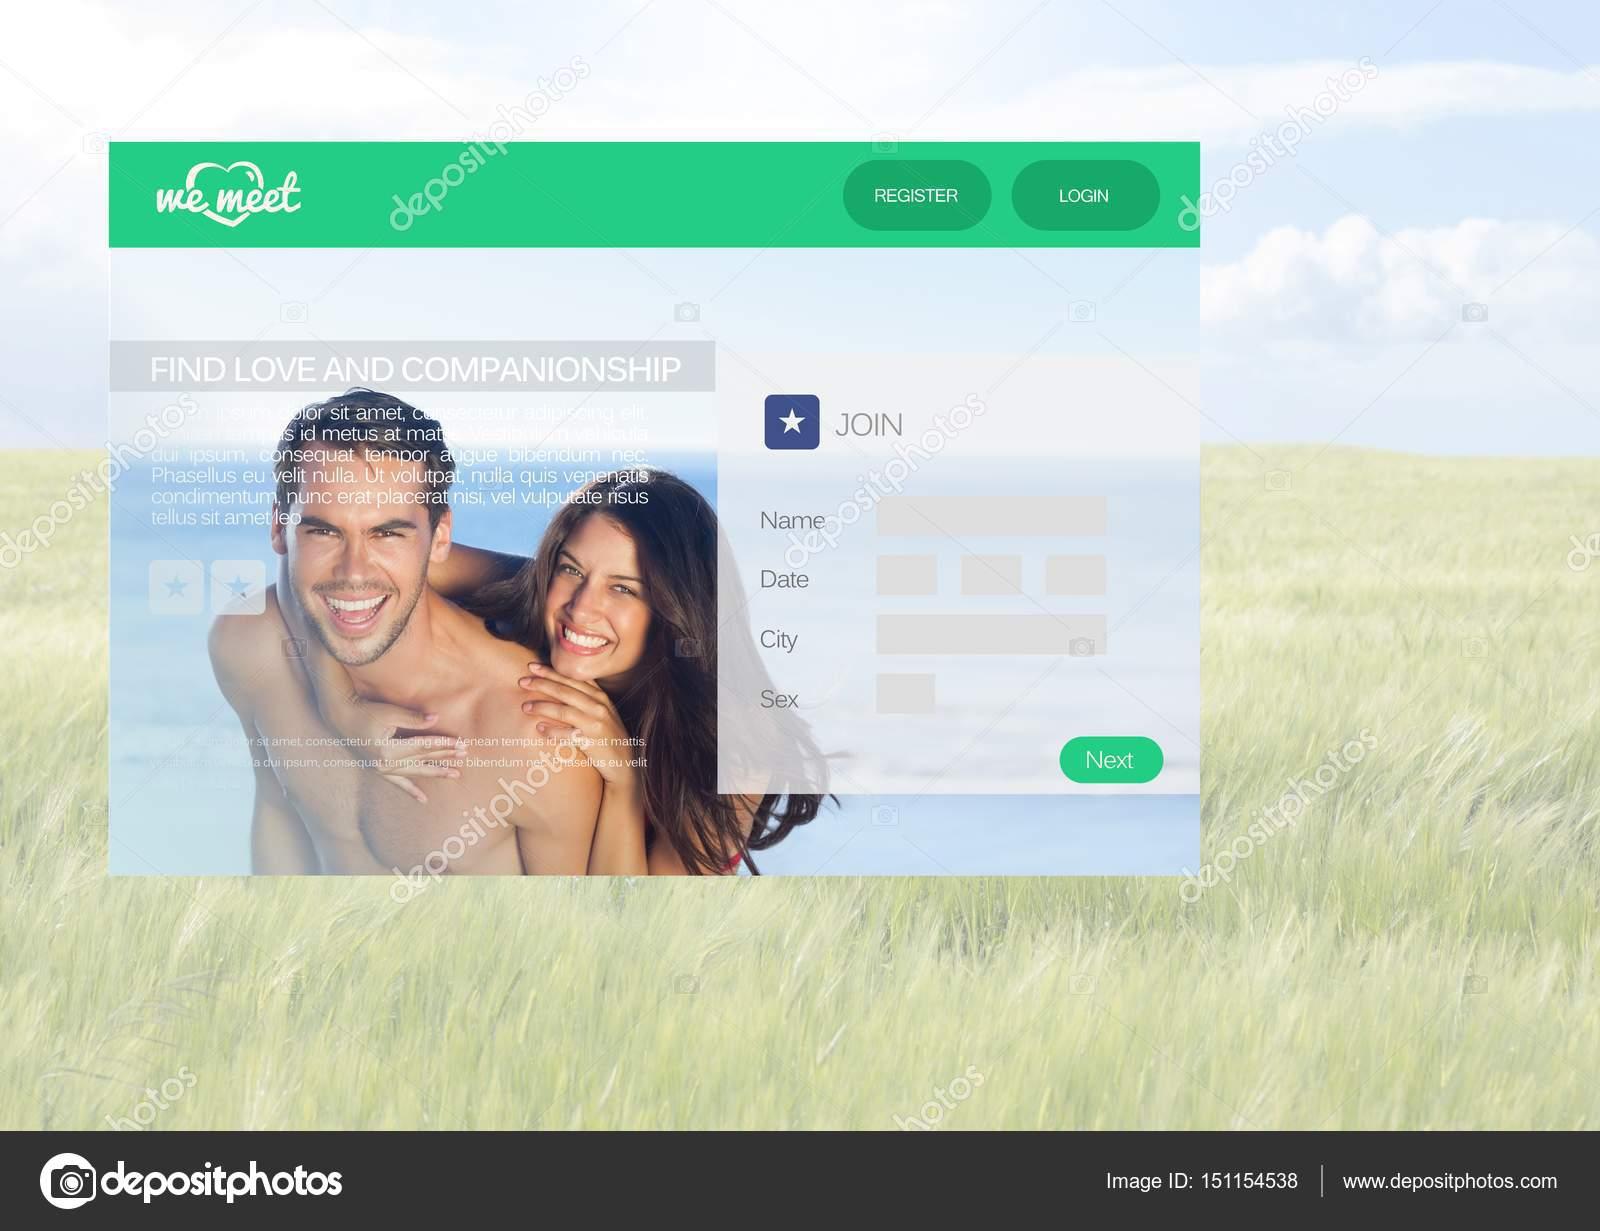 pot fumatori online dating